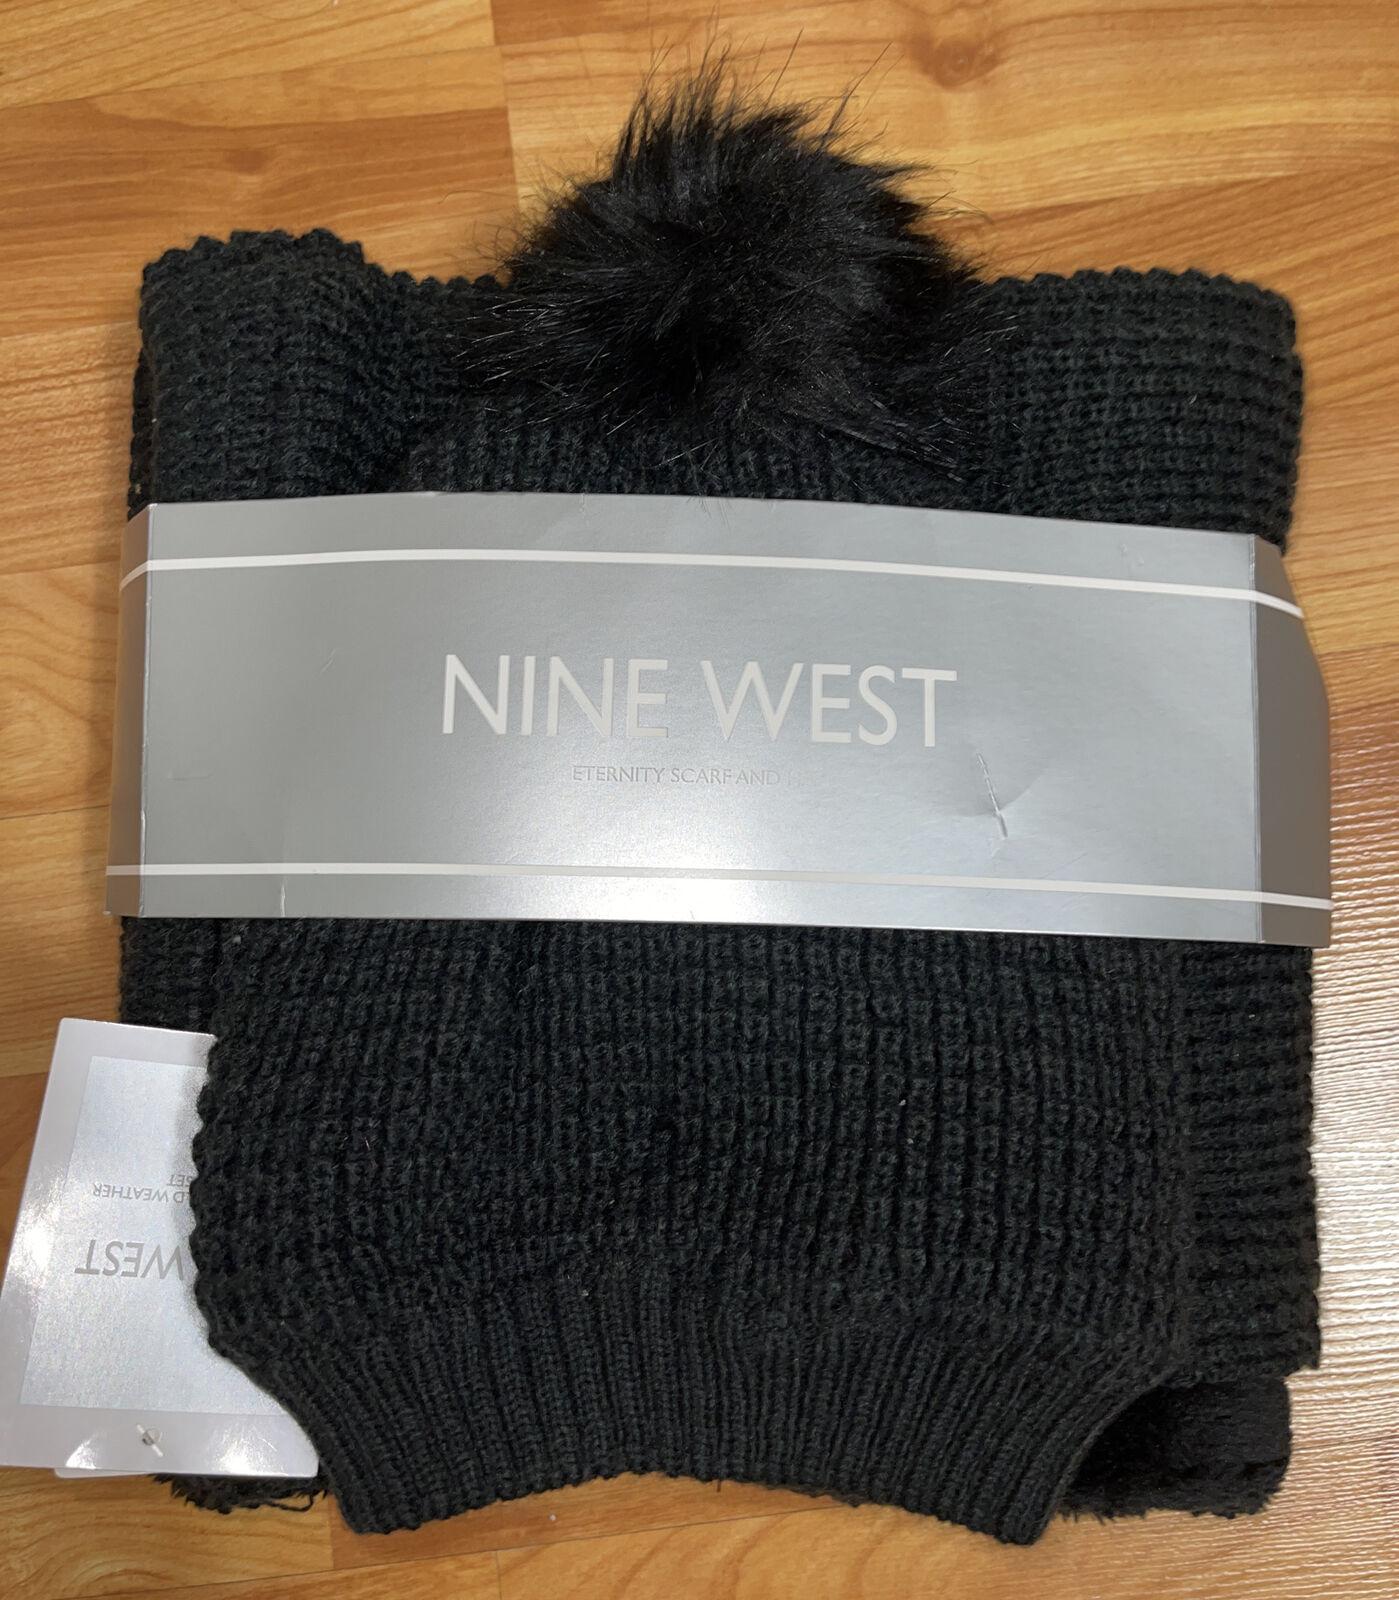 NEW NINE WEST Eternity Scarf and Hat Set Black O/S